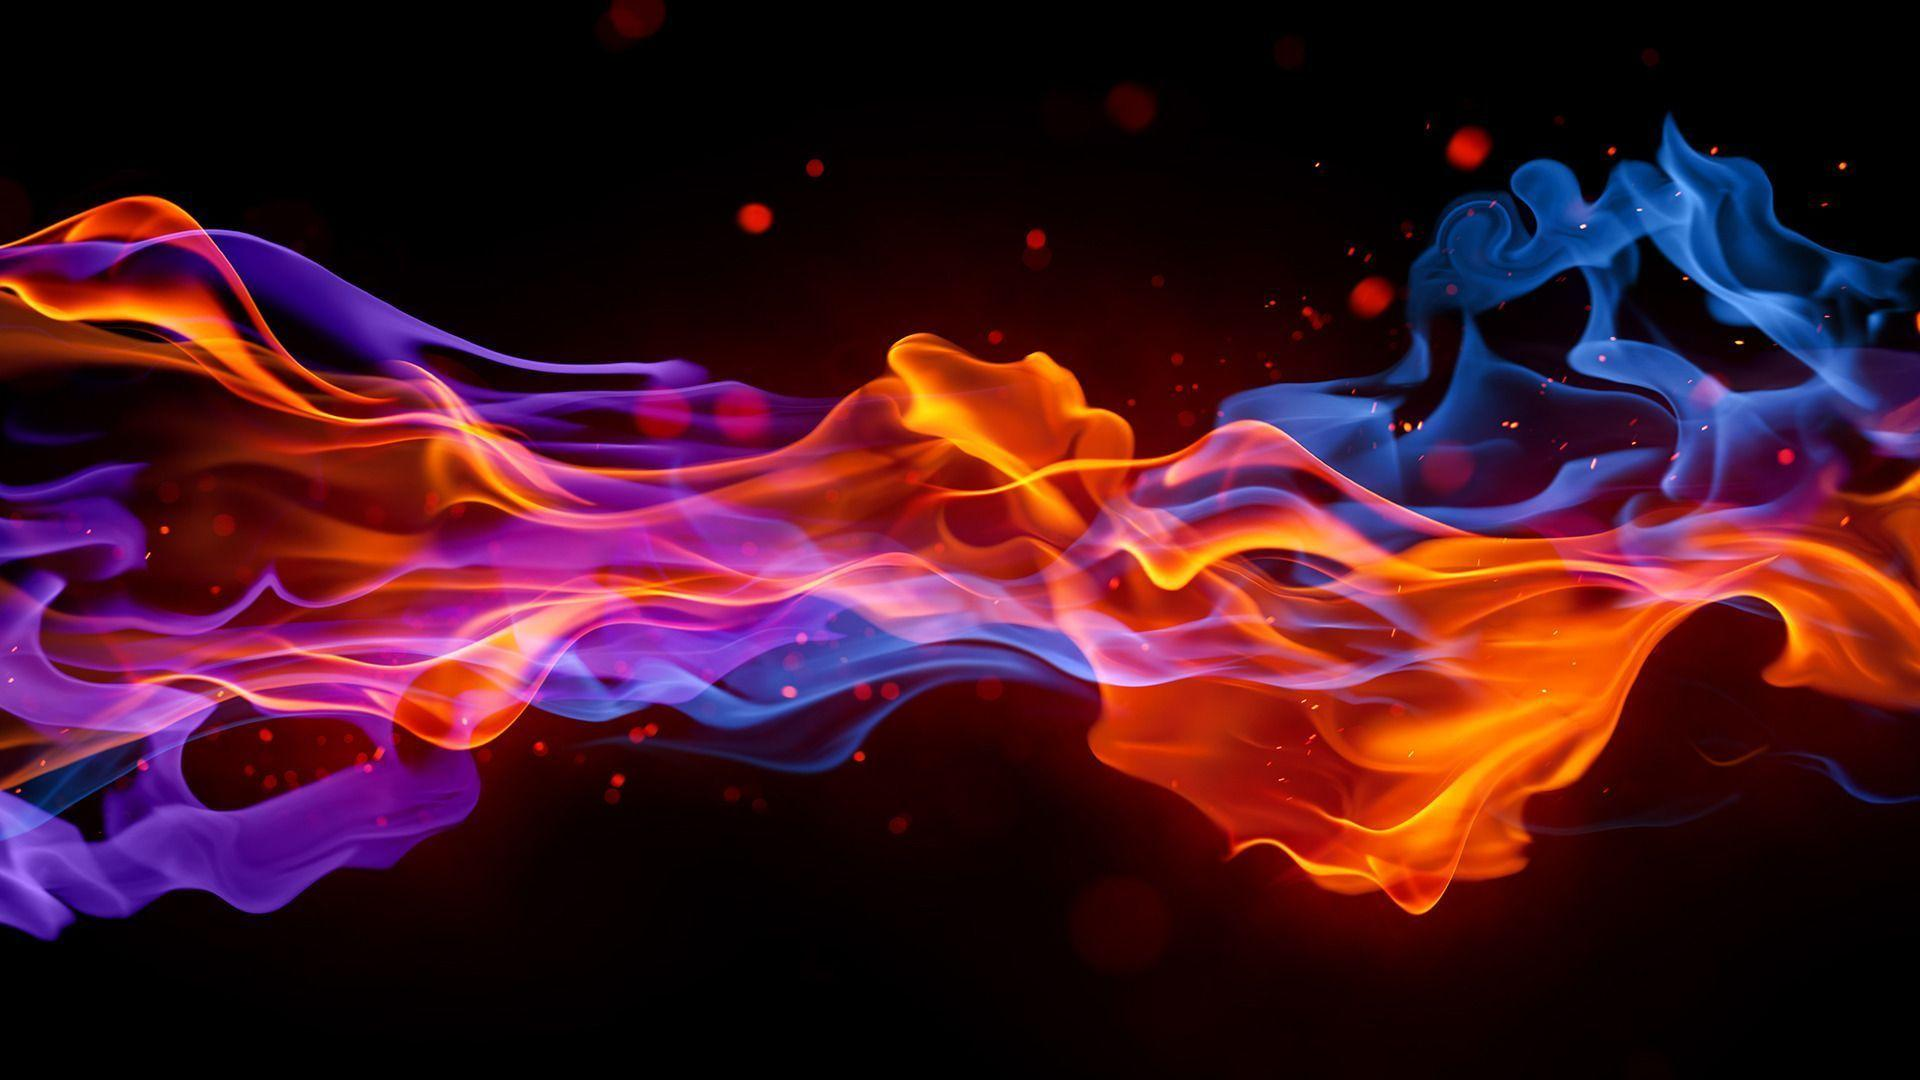 Fire Wallpapers HD